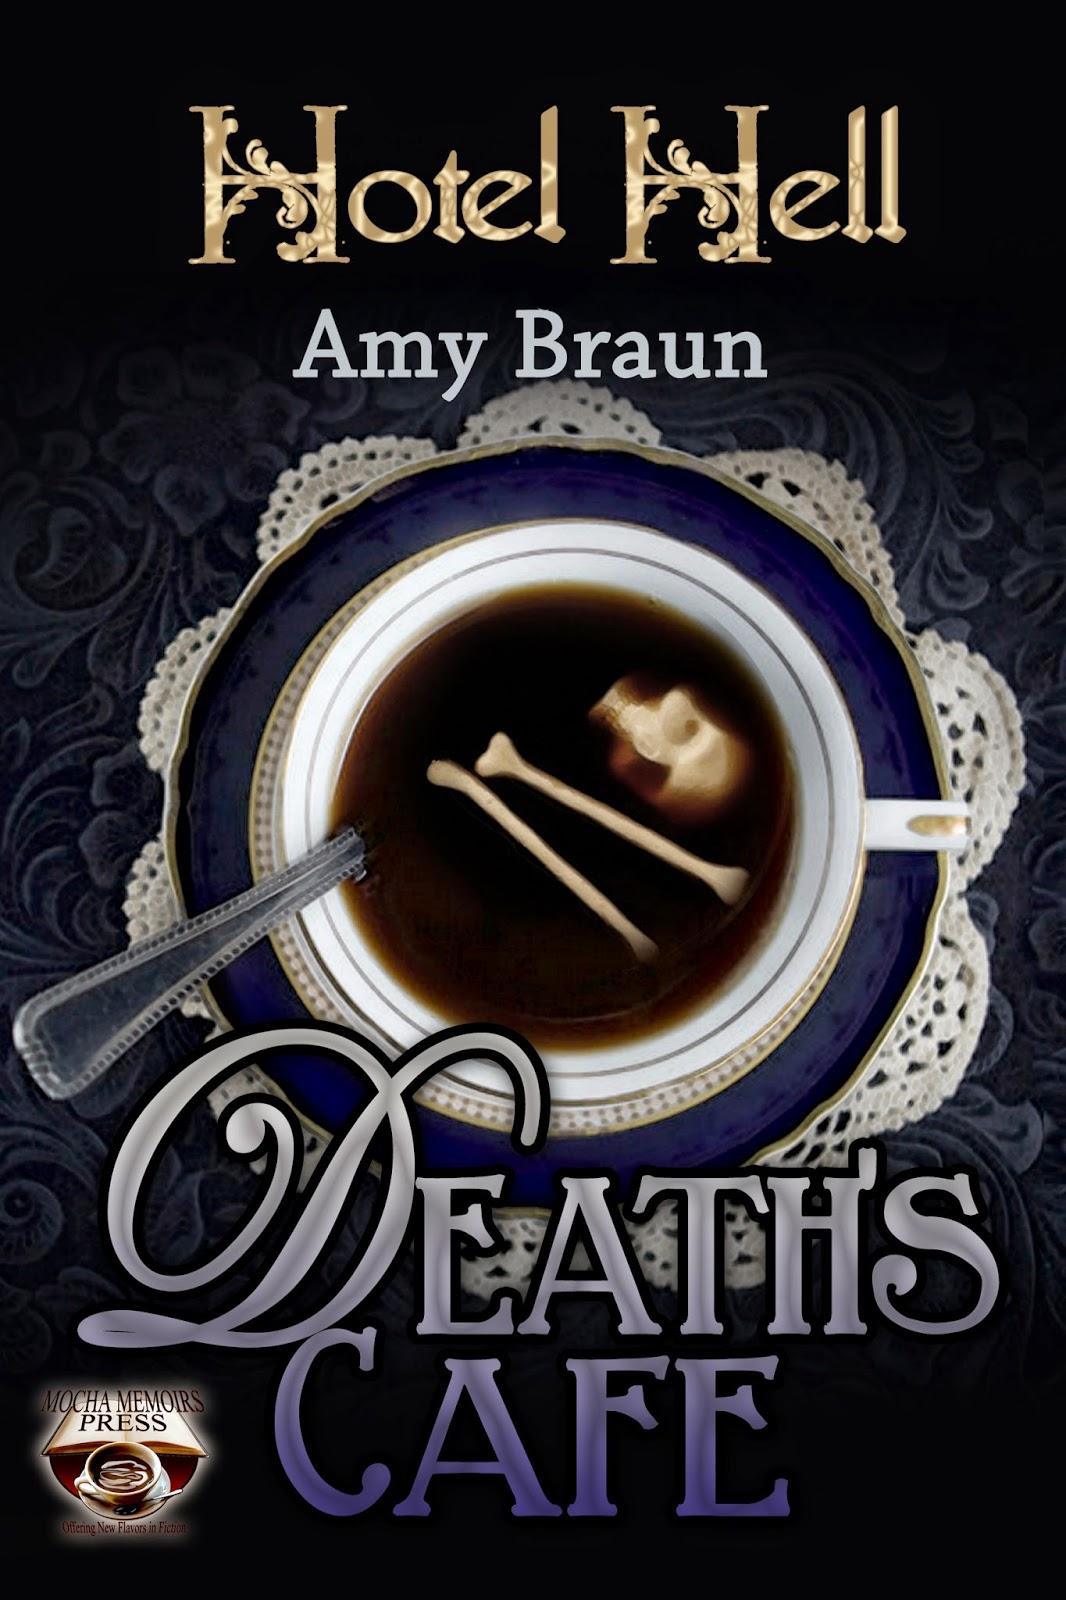 http://www.amazon.com/Deaths-Cafe-Hotel-Amy-Braun-ebook/dp/B00OAONK90